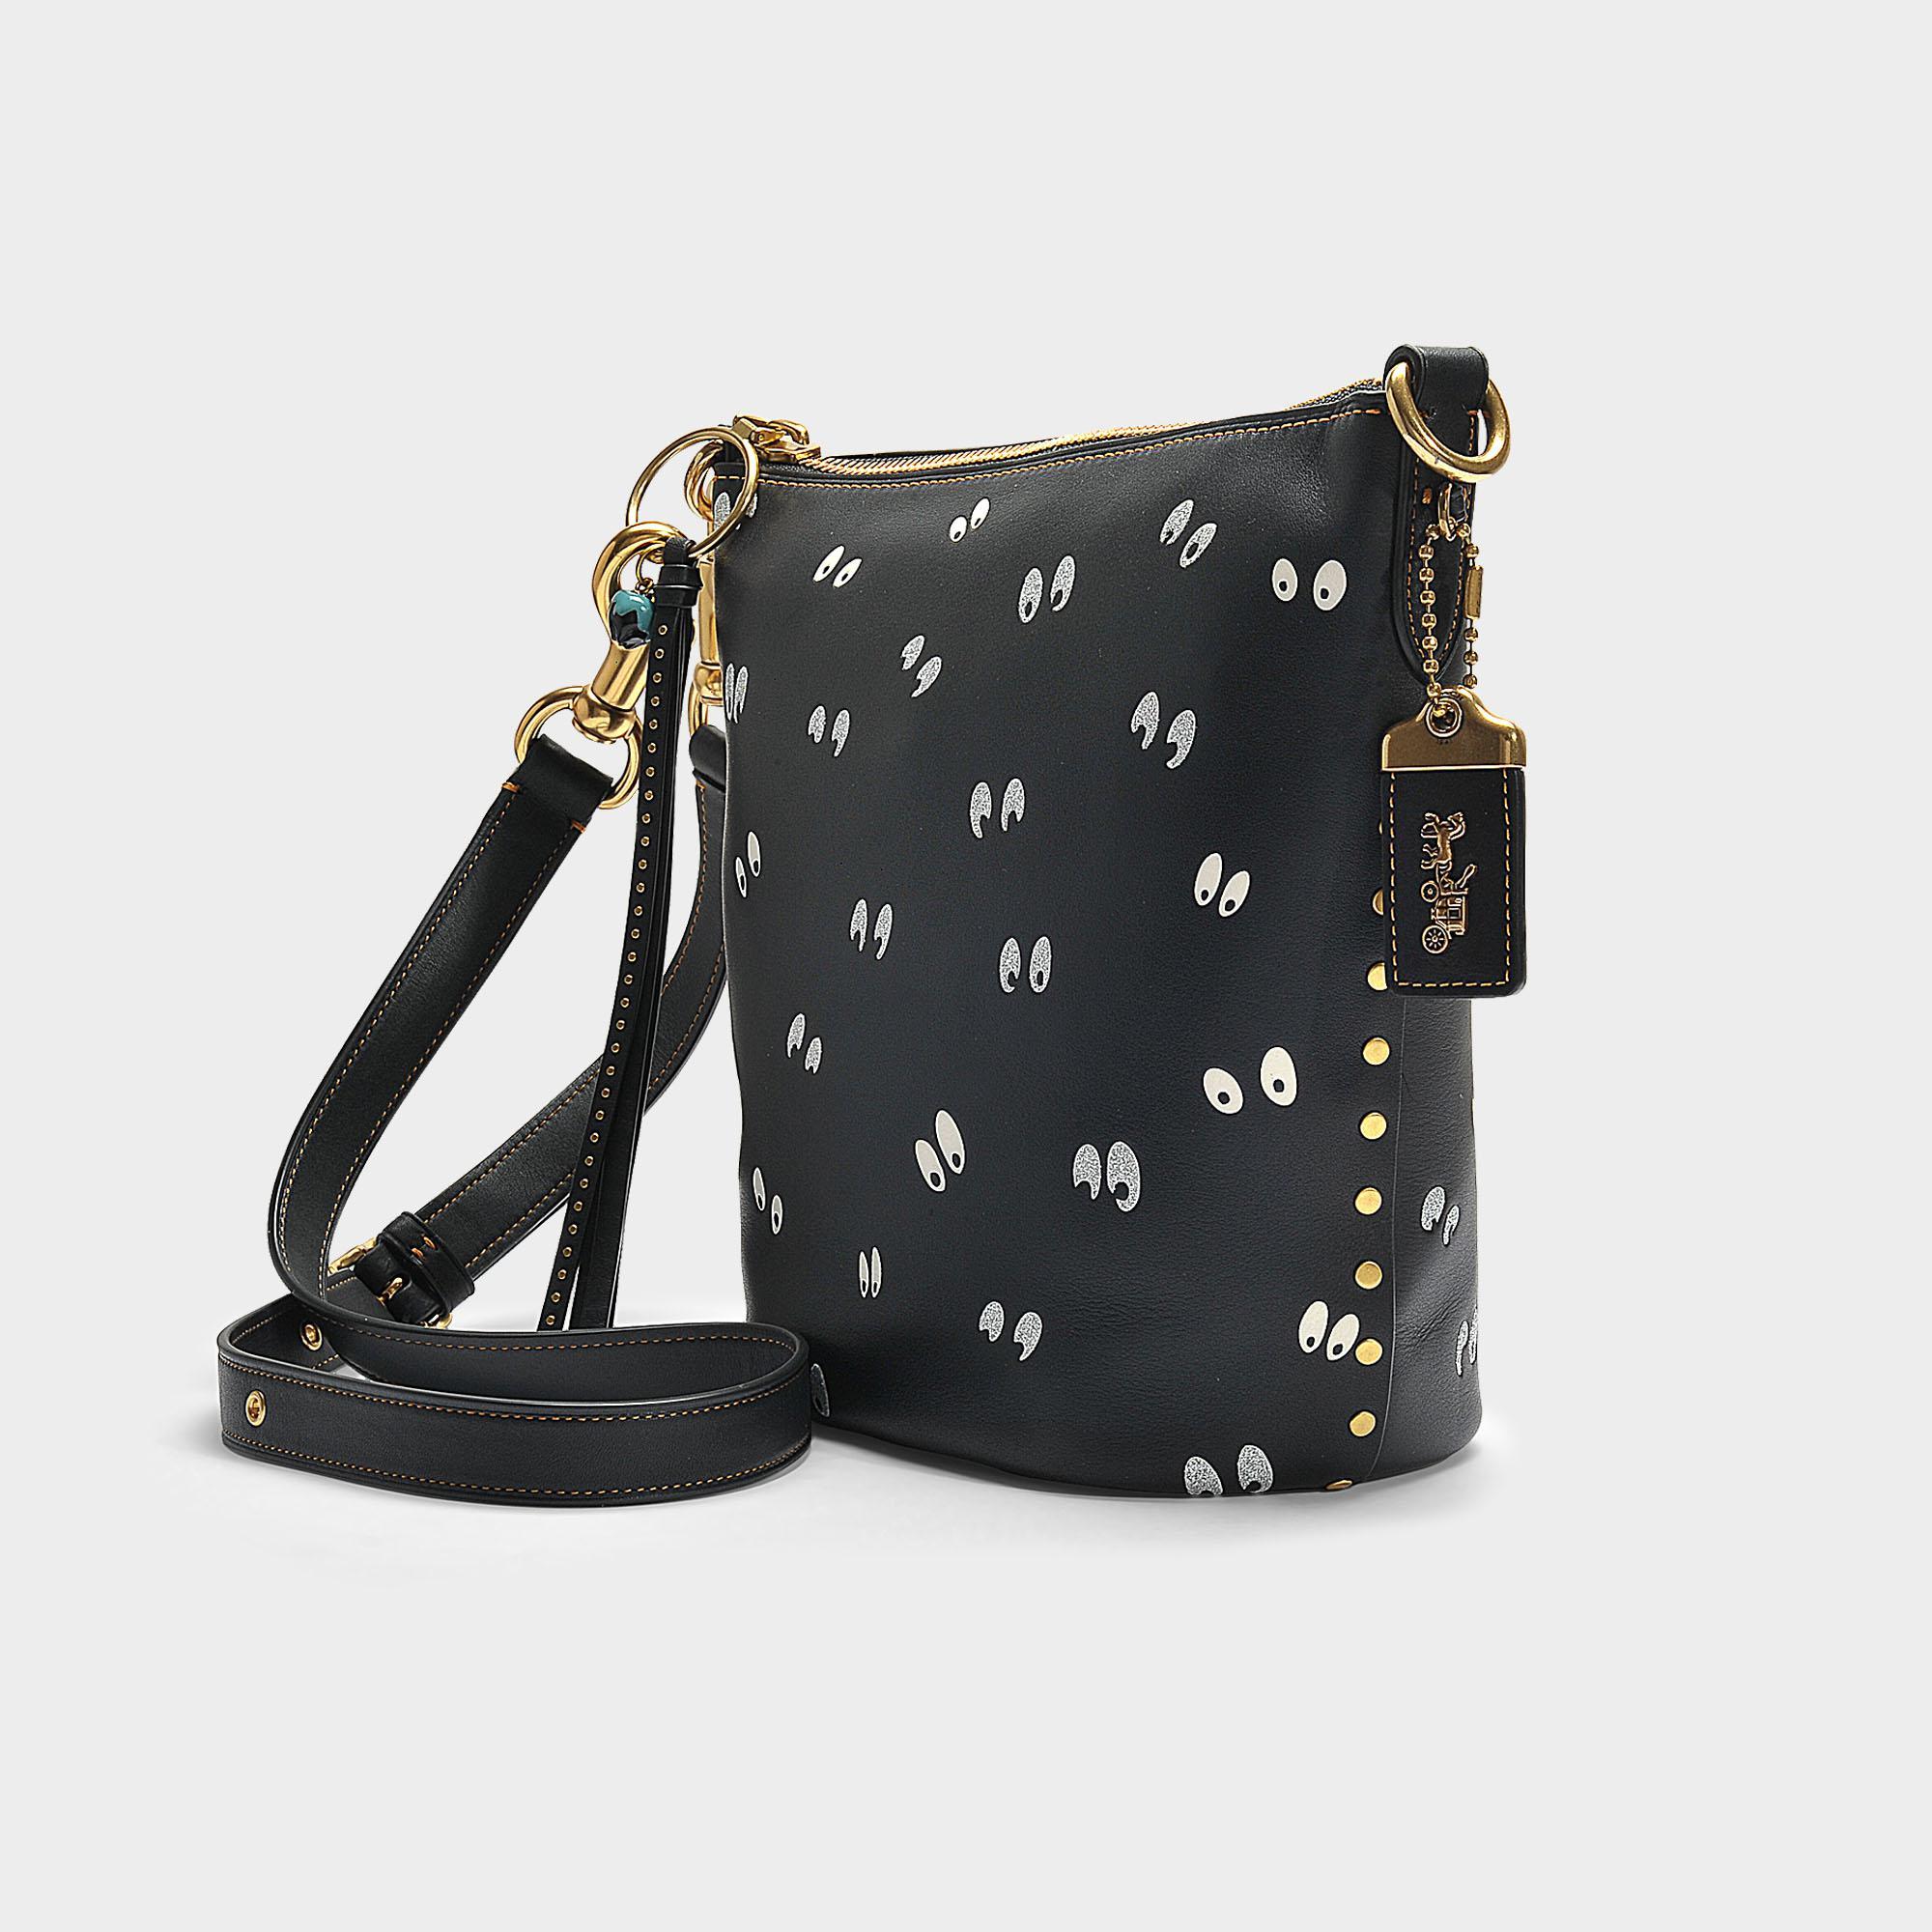 86f13b951a15 COACH Spooky Eyes Print Duffle 20 Bag In Black Calfskin - Lyst